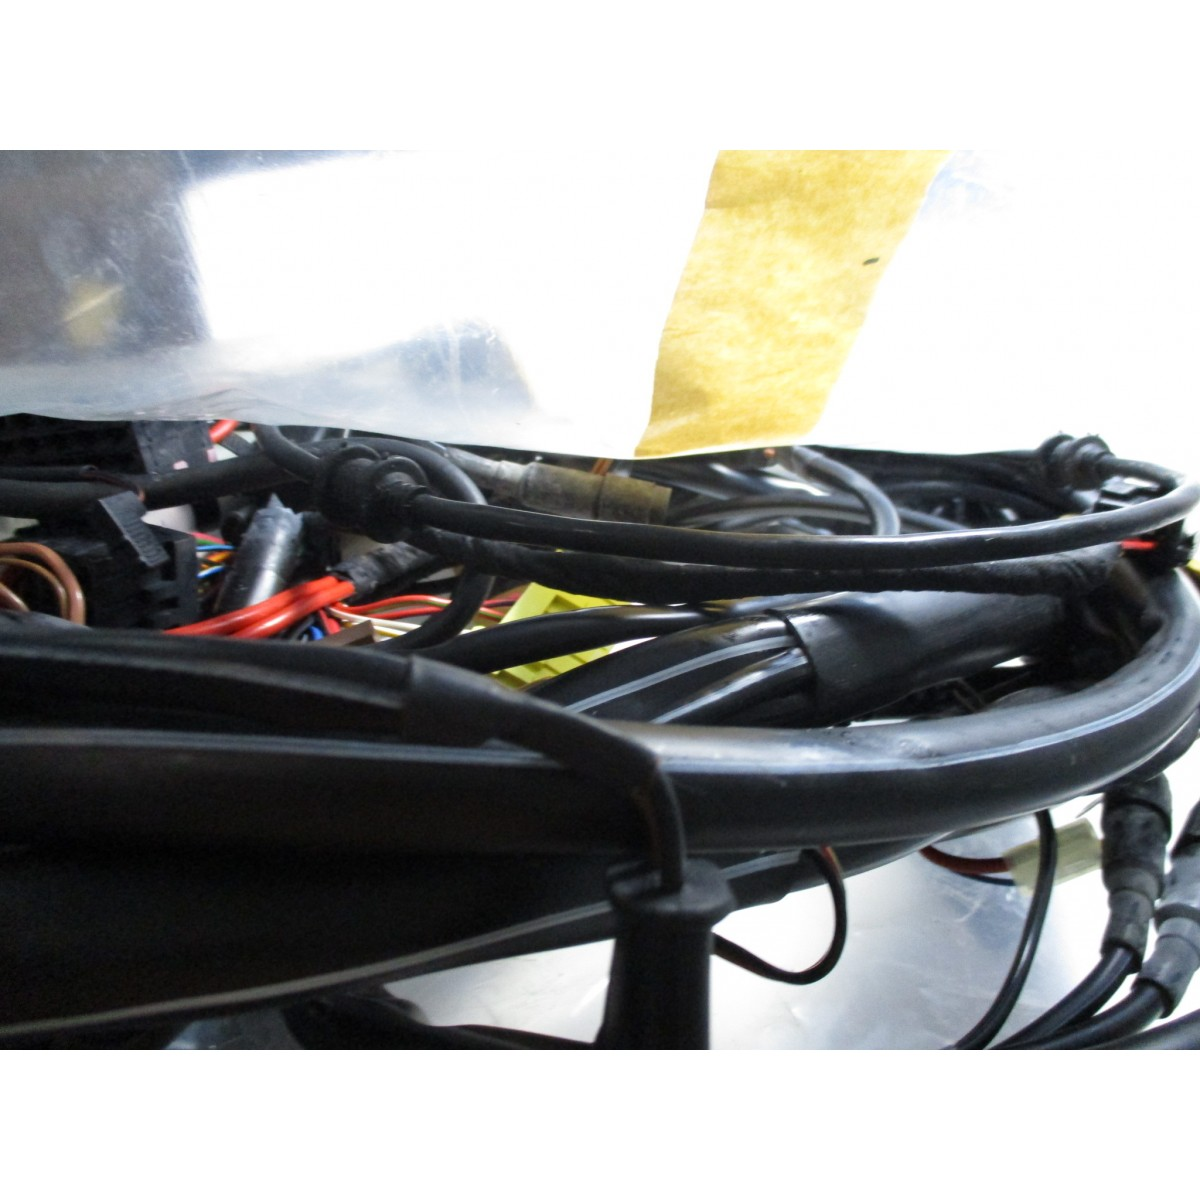 front wiring harness 944 Turbo 86 to 88 on pontiac grand am wiring harness, mercury sable wiring harness, porsche 944 speaker wiring, volkswagen beetle wiring harness, jeep cherokee wiring harness, sunbeam tiger wiring harness, amc amx wiring harness, volvo 1800 wiring harness, suzuki samurai wiring harness, nissan truck wiring harness, ford f100 wiring harness, bmw e28 wiring harness, buick grand national wiring harness, porsche 944 starter wiring, mazda rx7 wiring harness, mini cooper wiring harness,